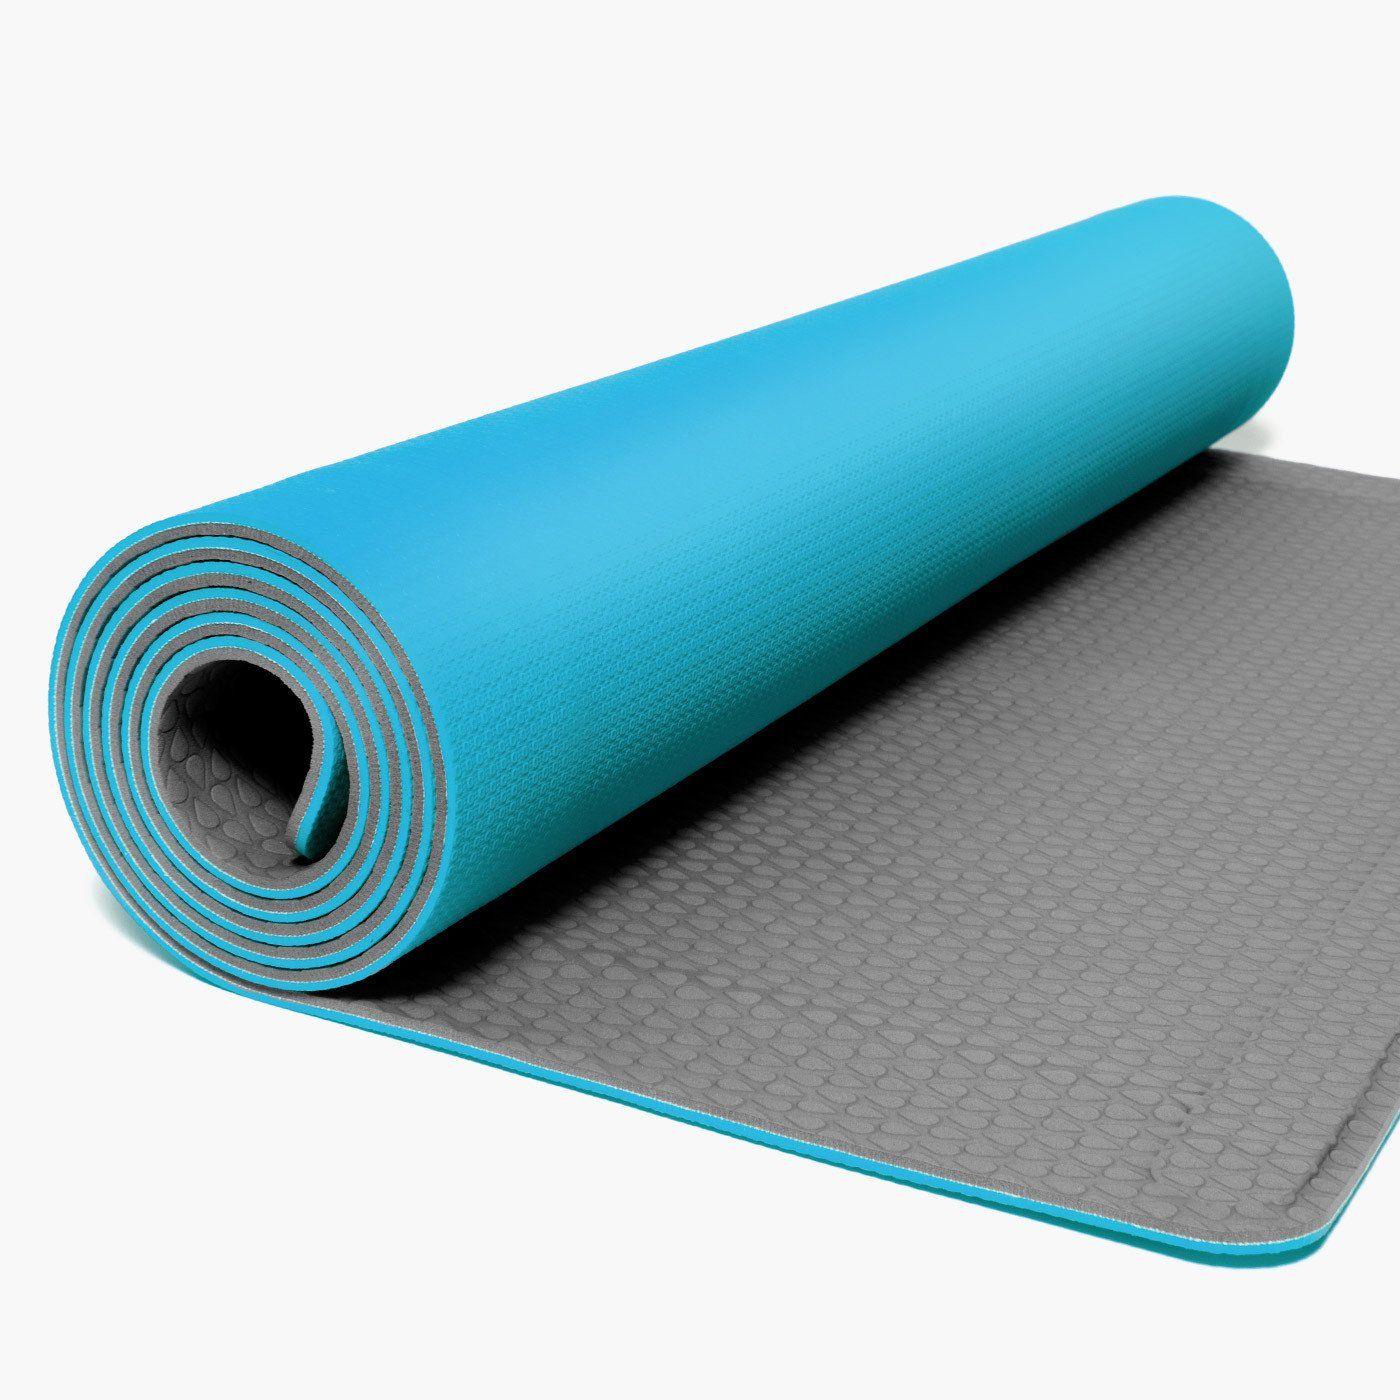 Yoyo Mats Self Rolling Fitness Yoga Mat 24 X 72 Blue Grey 24 X72 5mm 2 75 Lbs Lay Down Flat With No Curl Yoga Accessories Yoga Mat Yoga Fitness